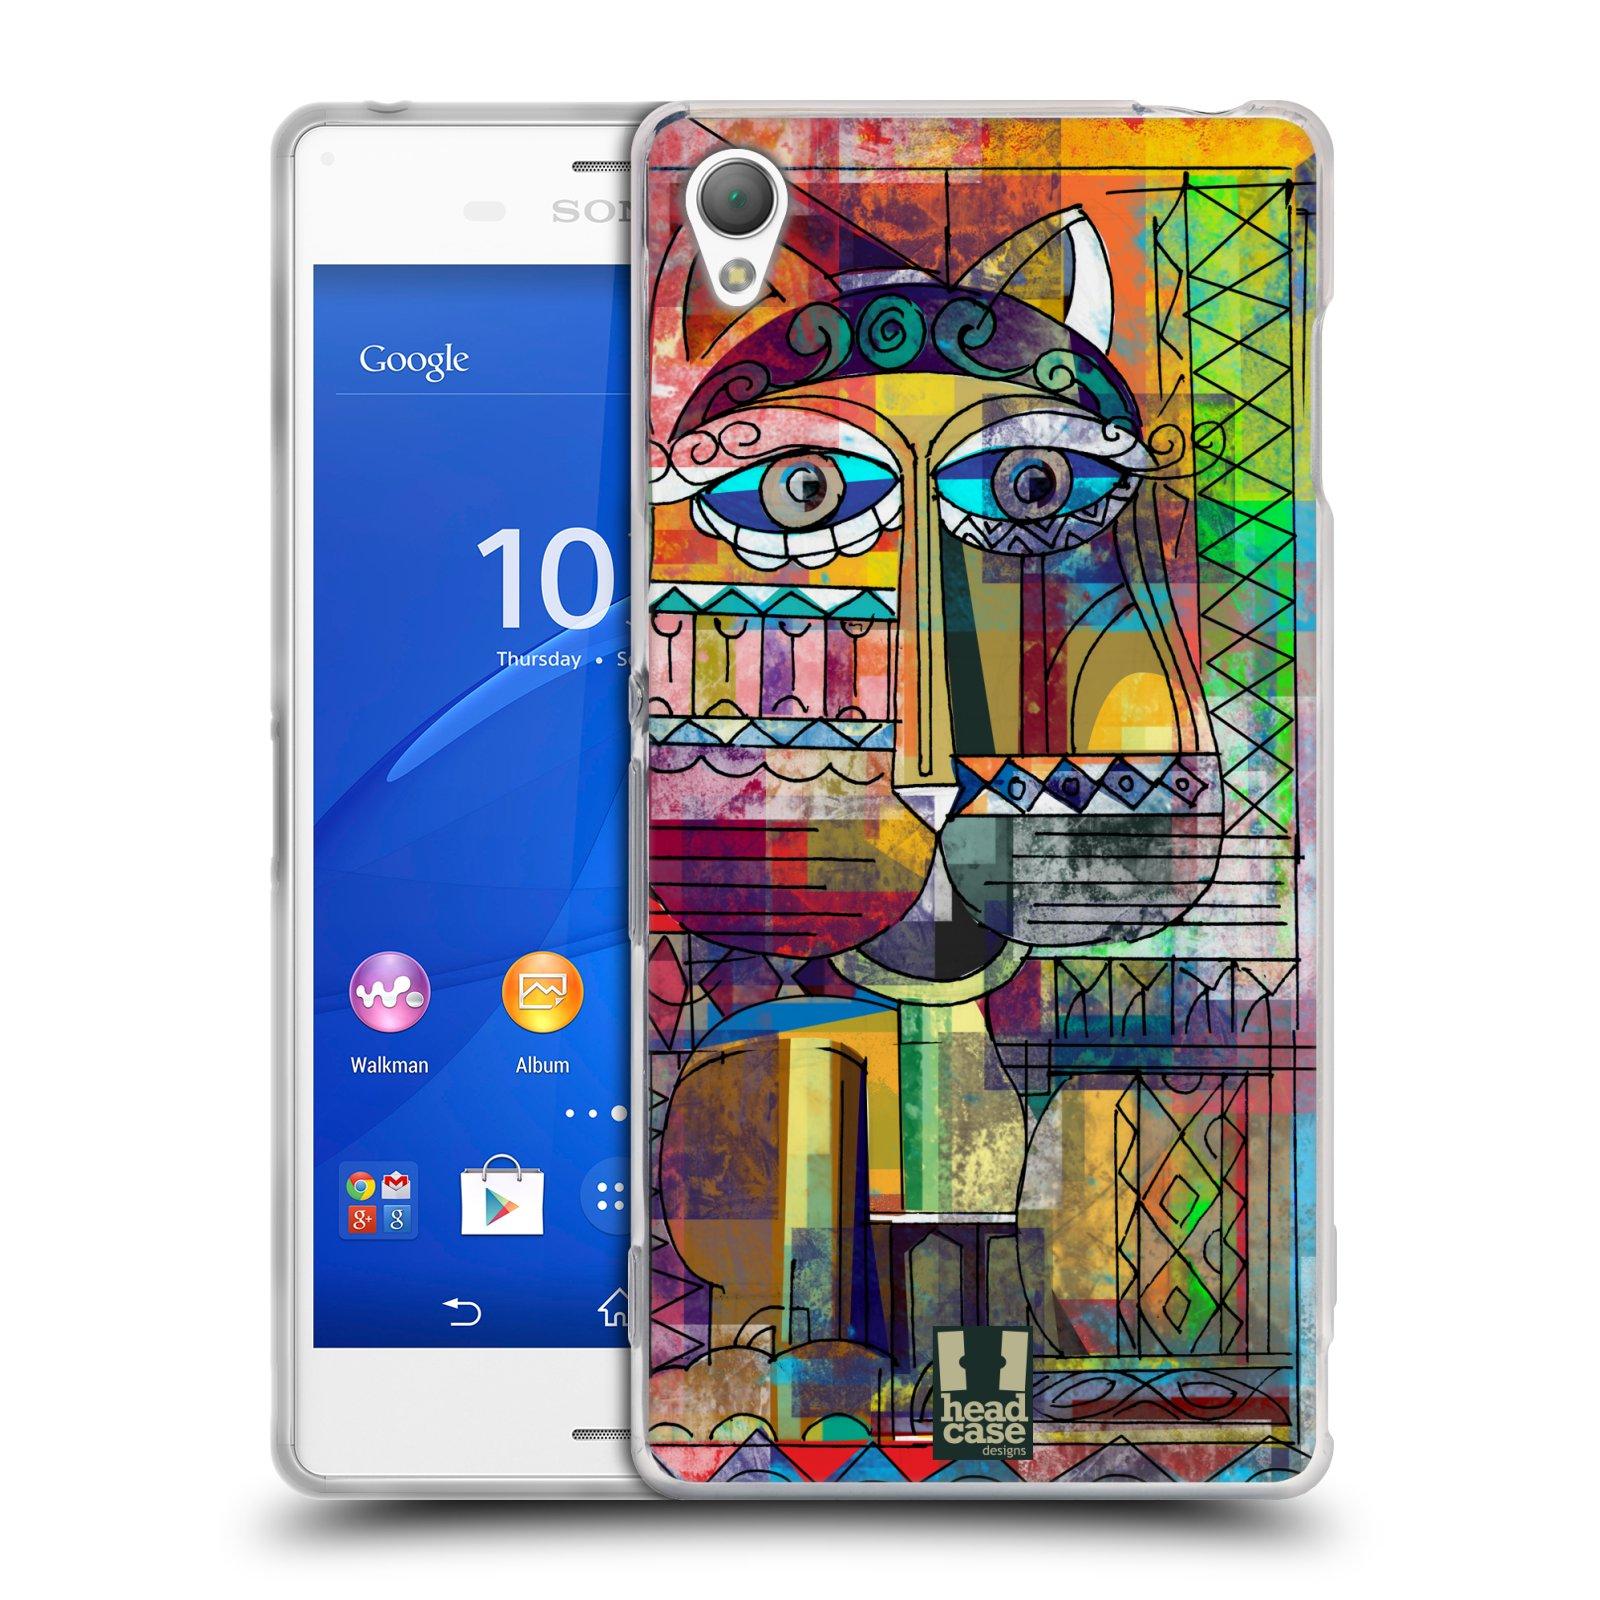 Silikonové pouzdro na mobil Sony Xperia Z3 D6603 HEAD CASE AZTEC KORAT